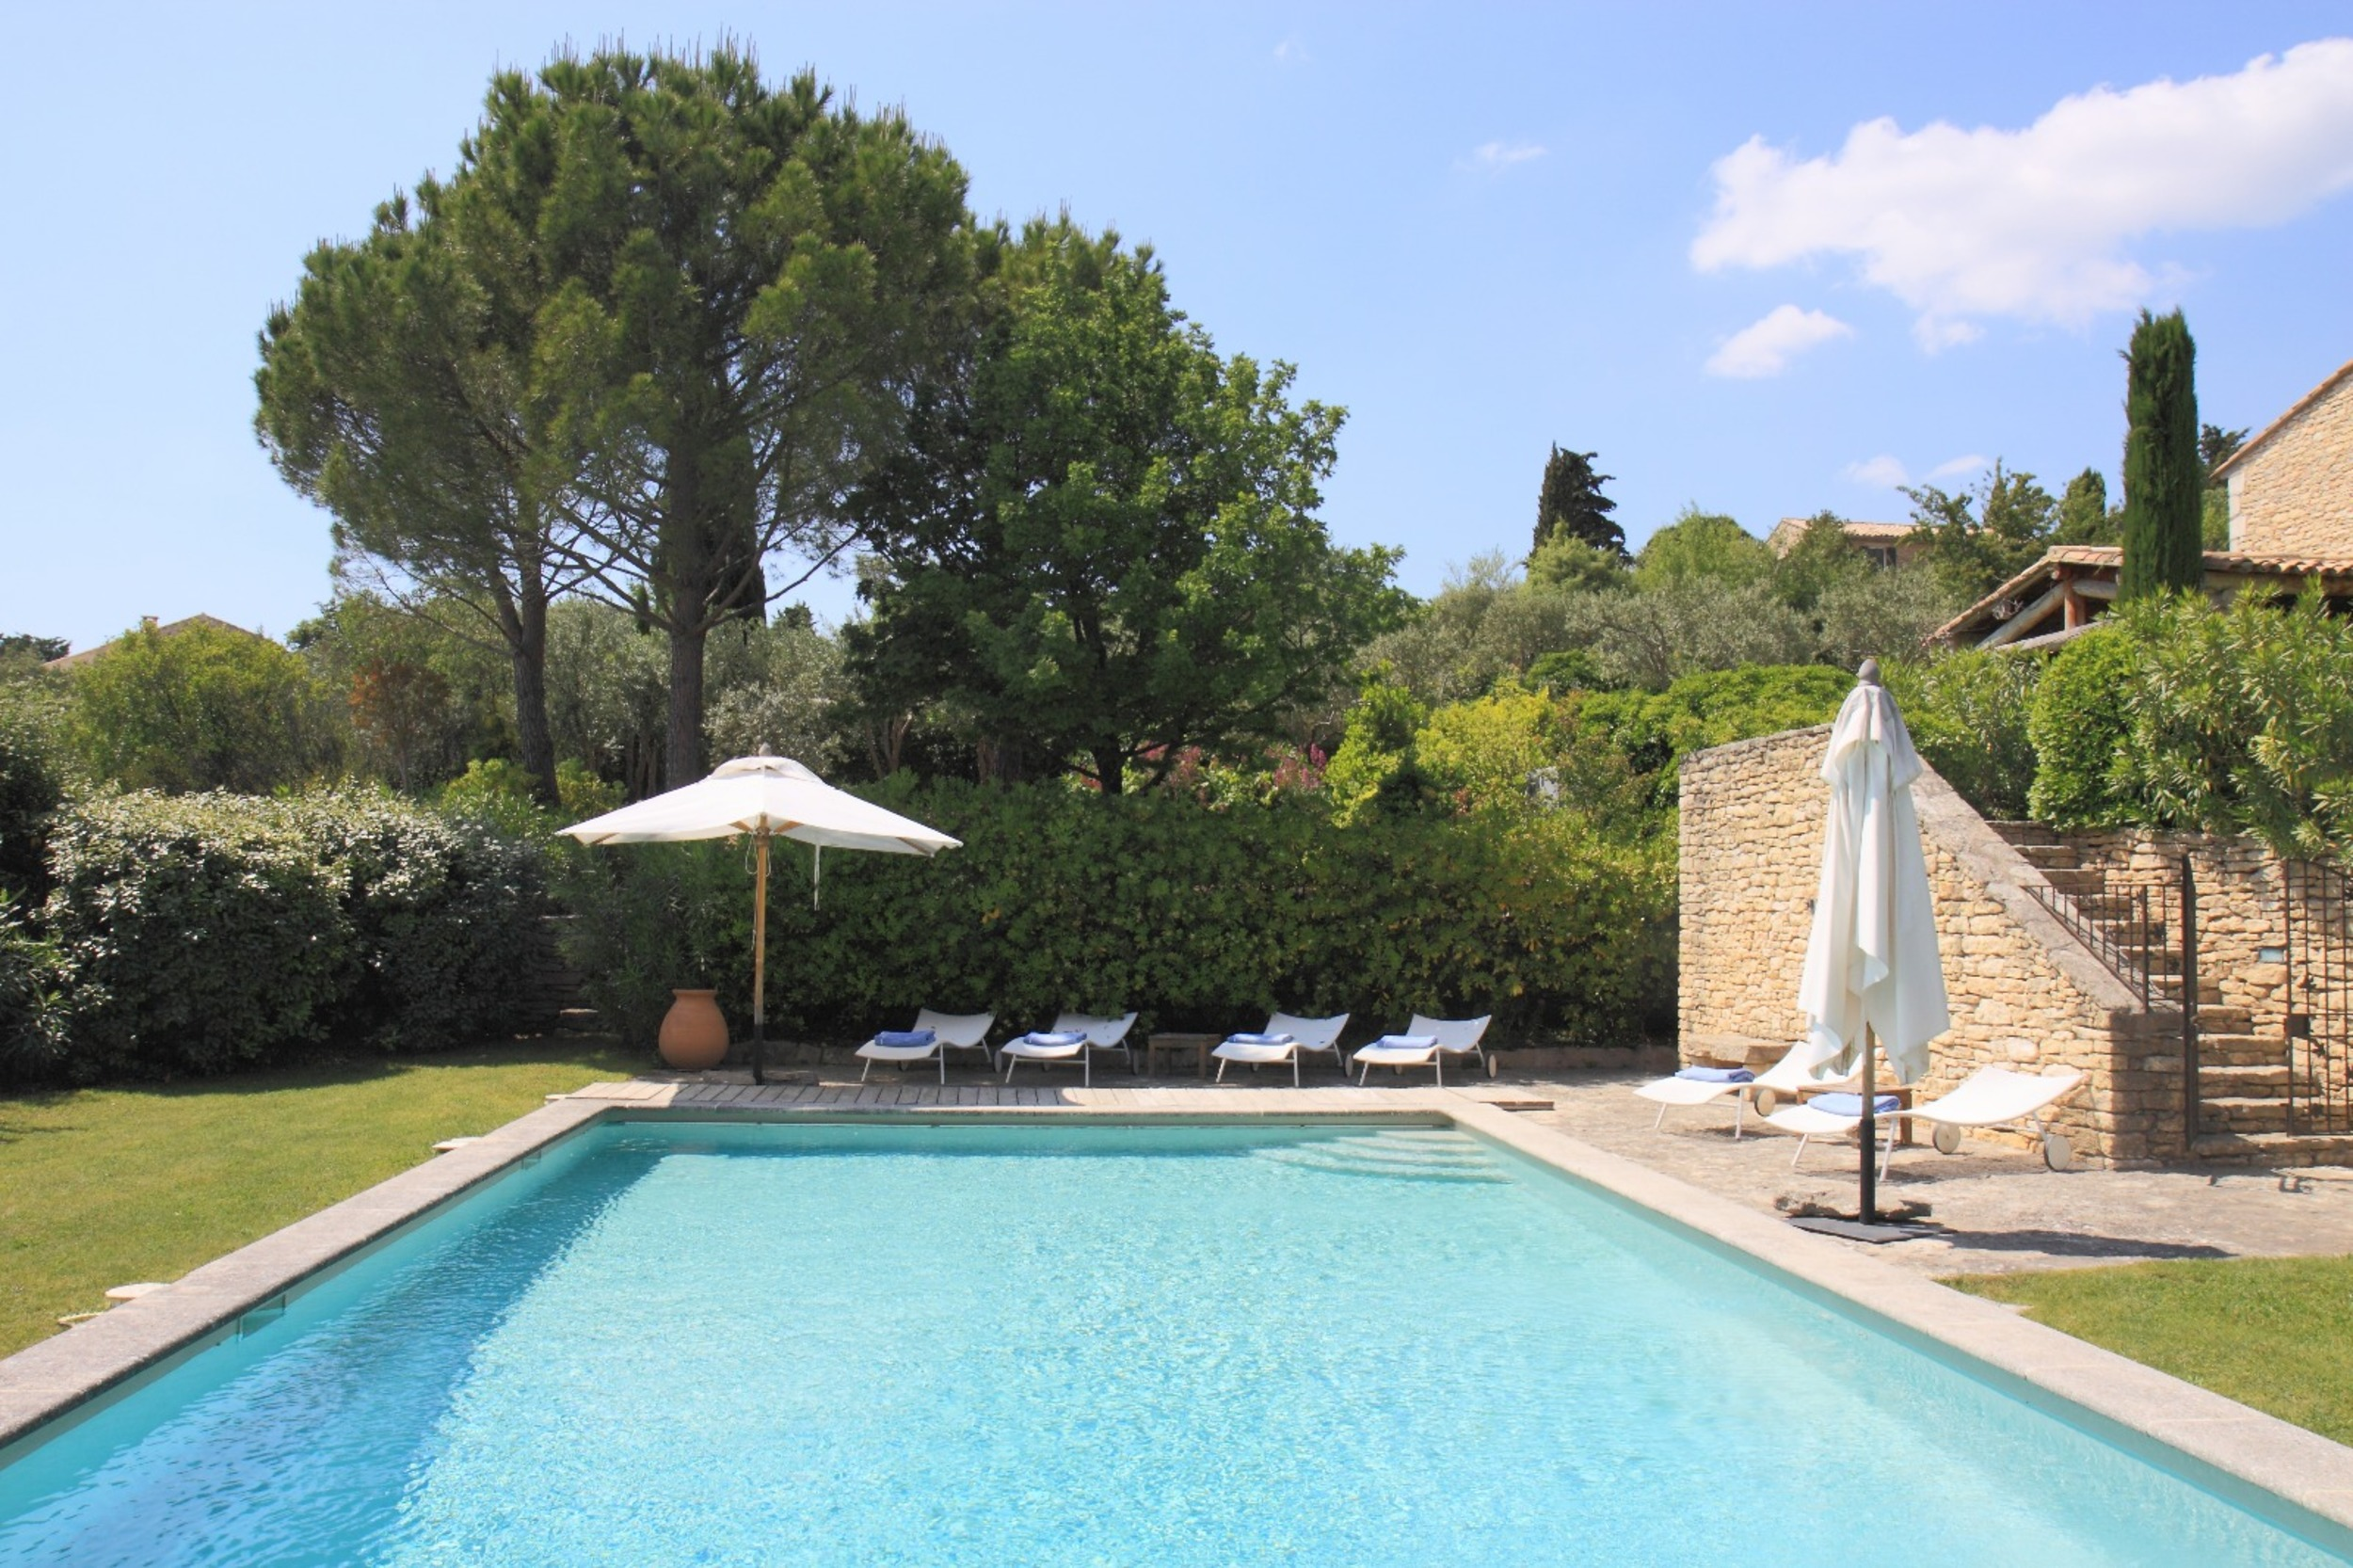 Holiday house Der Fall - Fabelhaftes Landhaus in Gordes (2520443), Gordes, Vaucluse, Provence - Alps - Côte d'Azur, France, picture 2